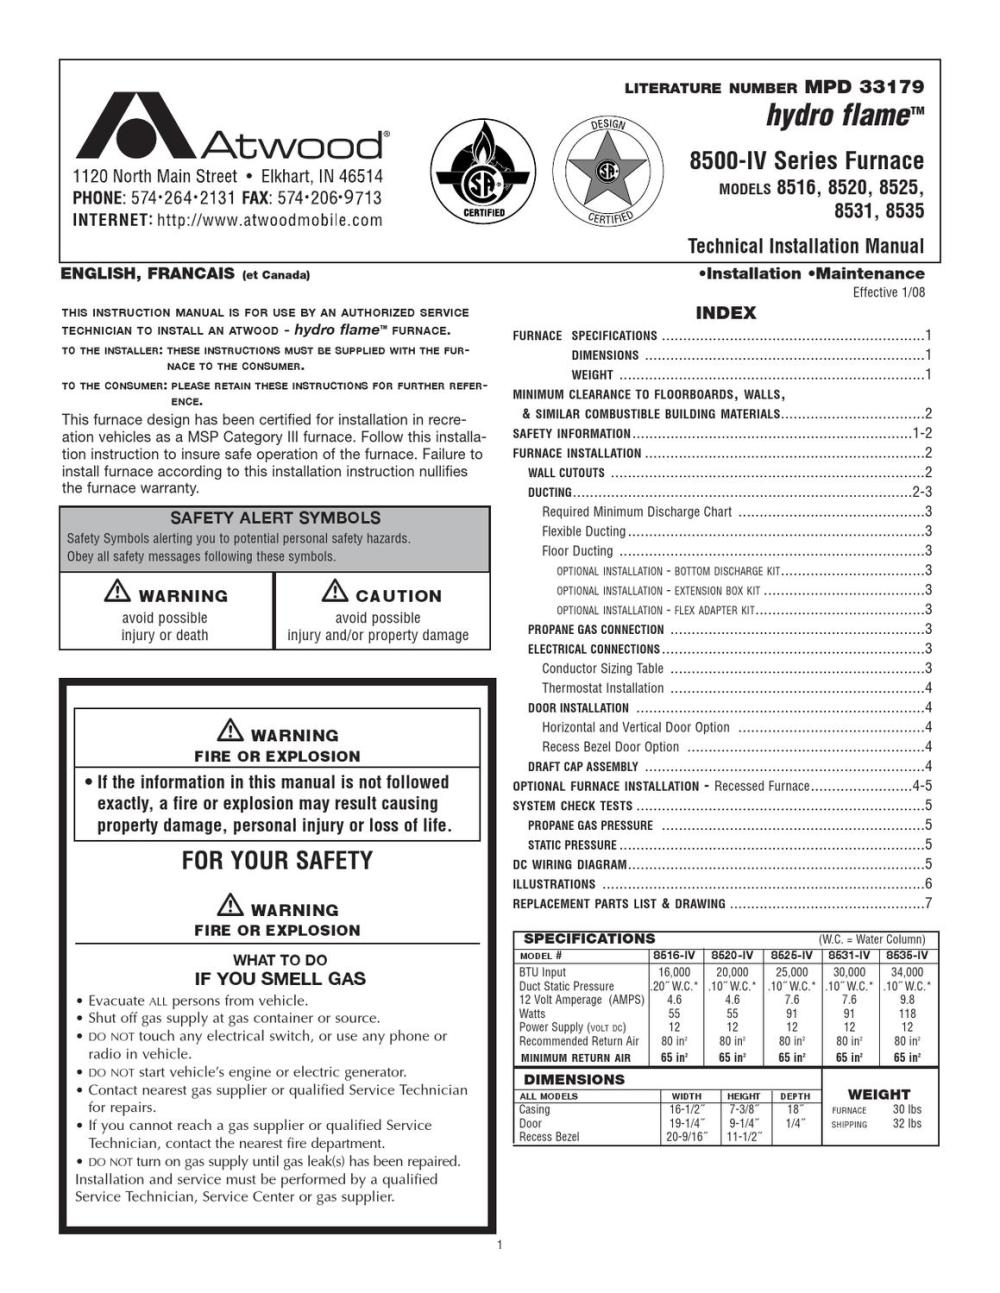 medium resolution of atwood hydro flame 8500 iv furnace install maintenance